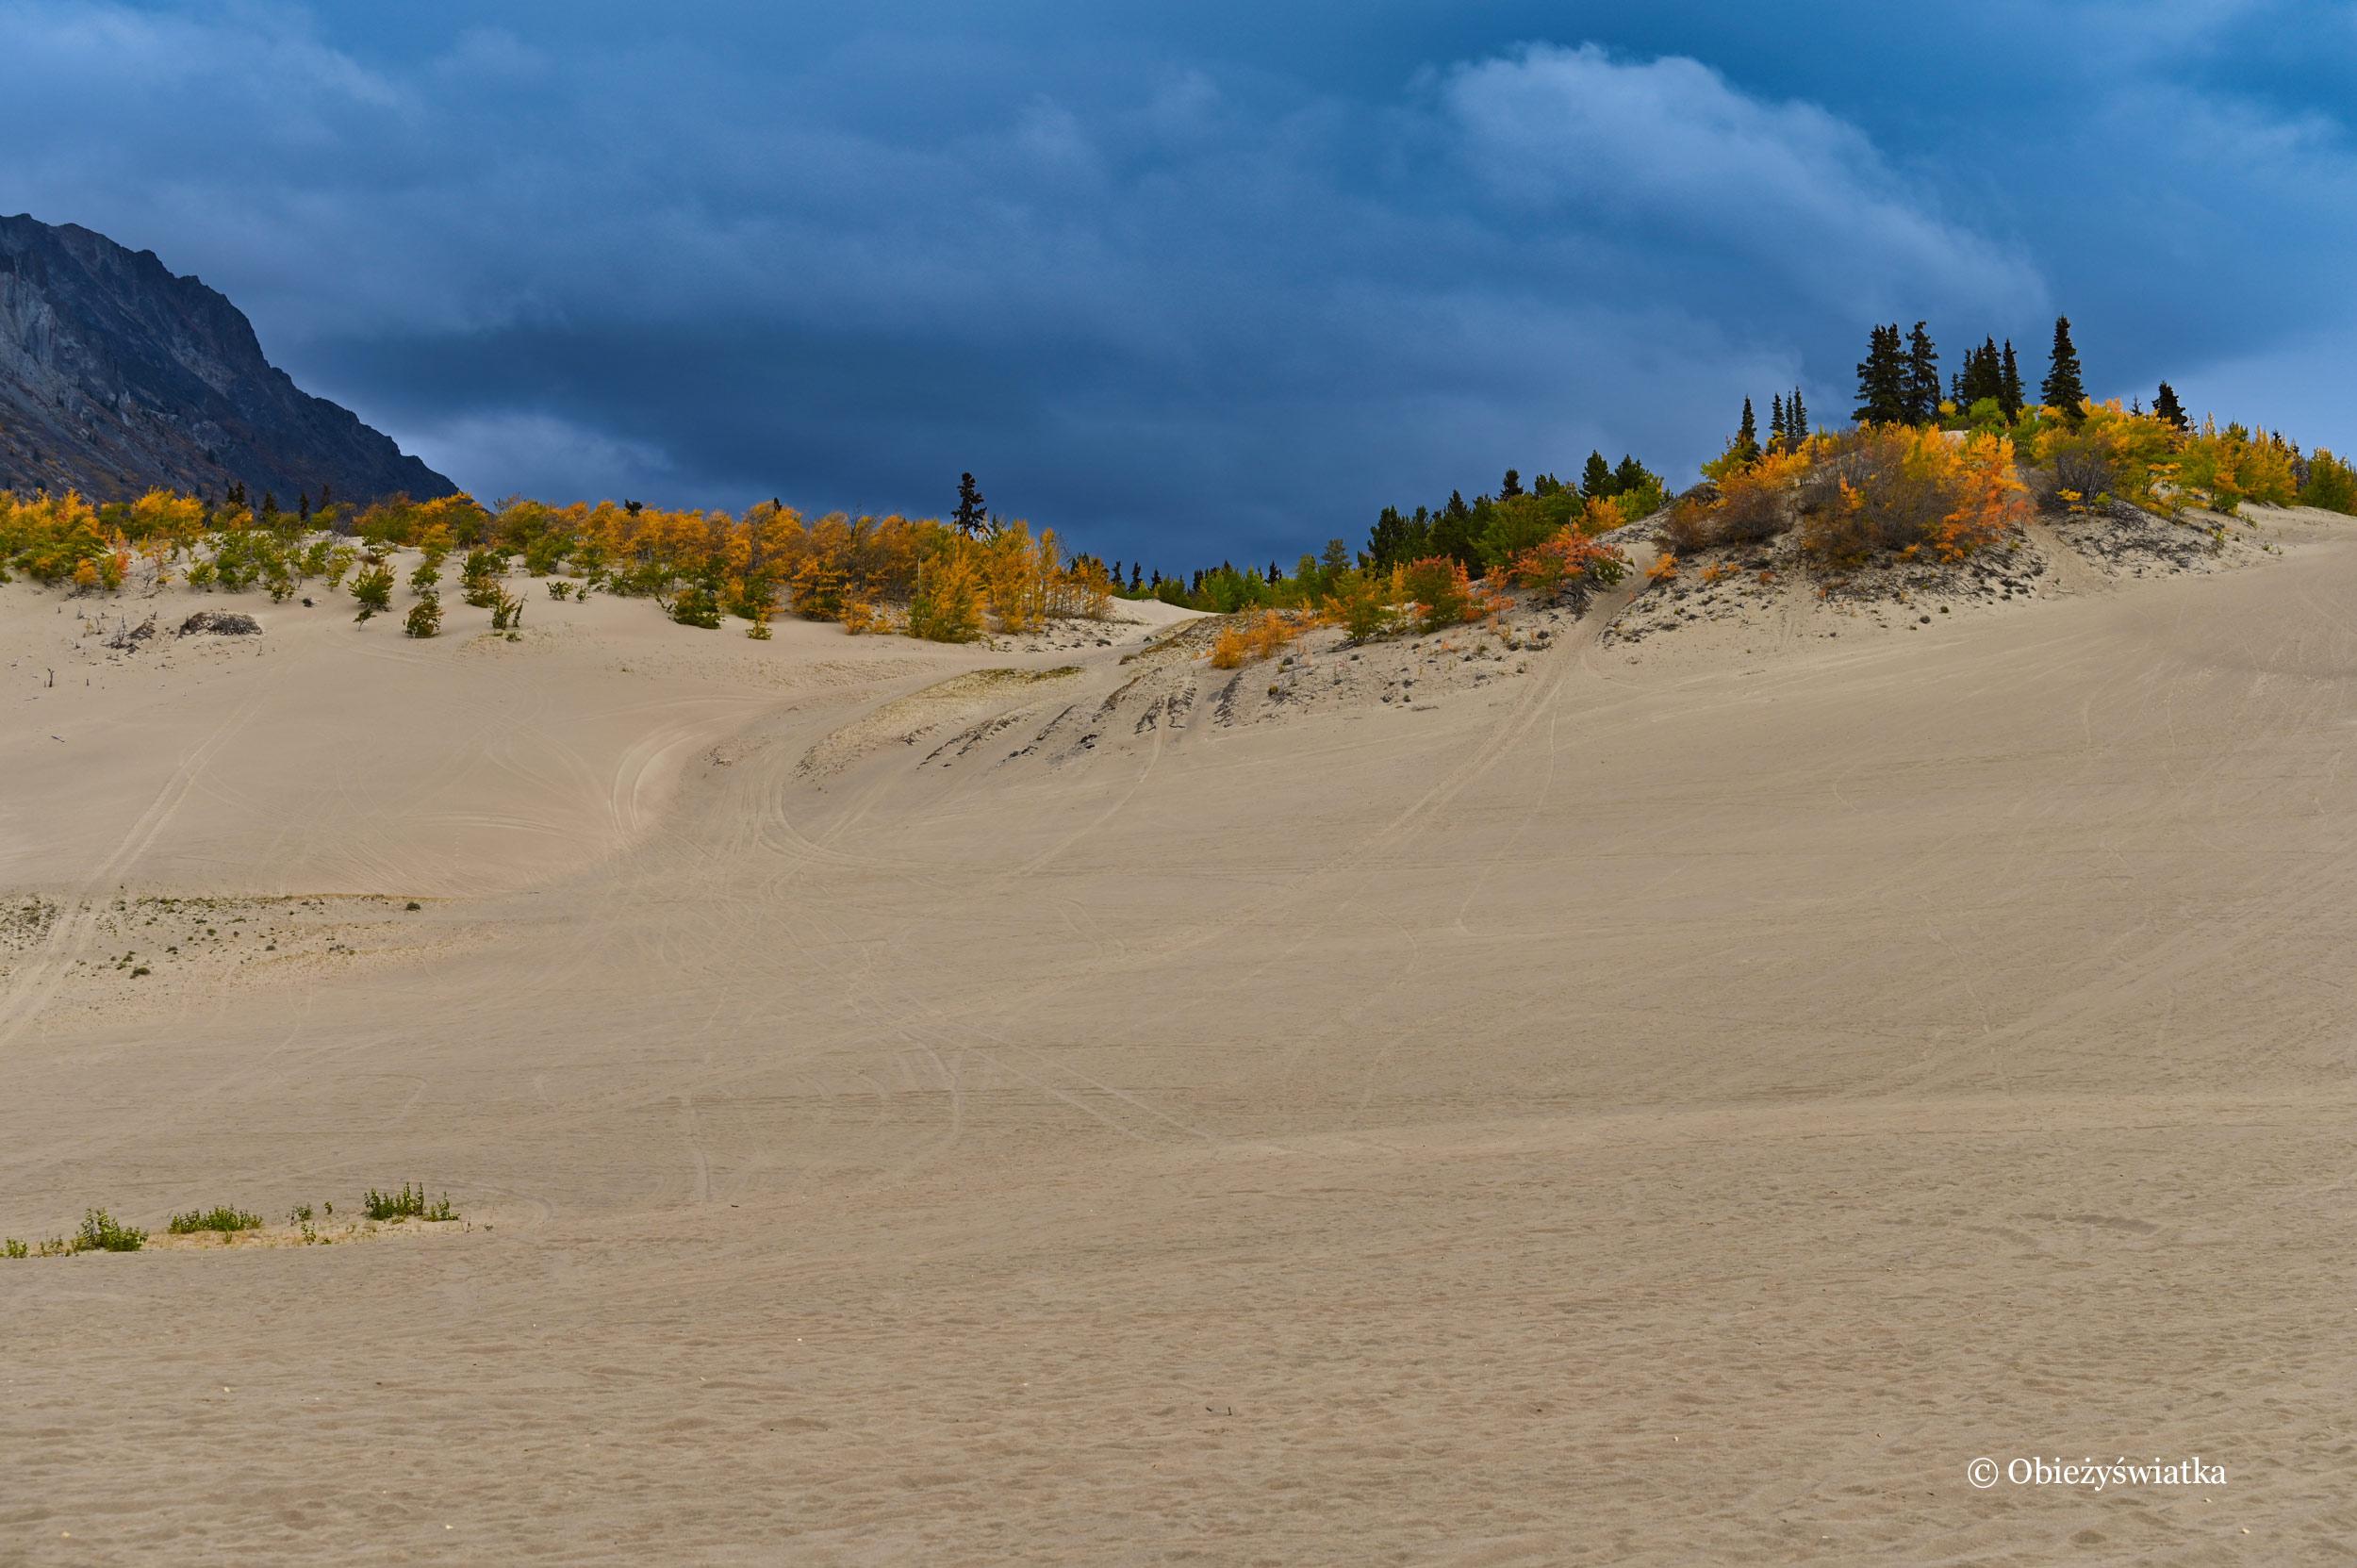 Wydmowe wzgórza - Carcross Desert, Yukon, Kanada